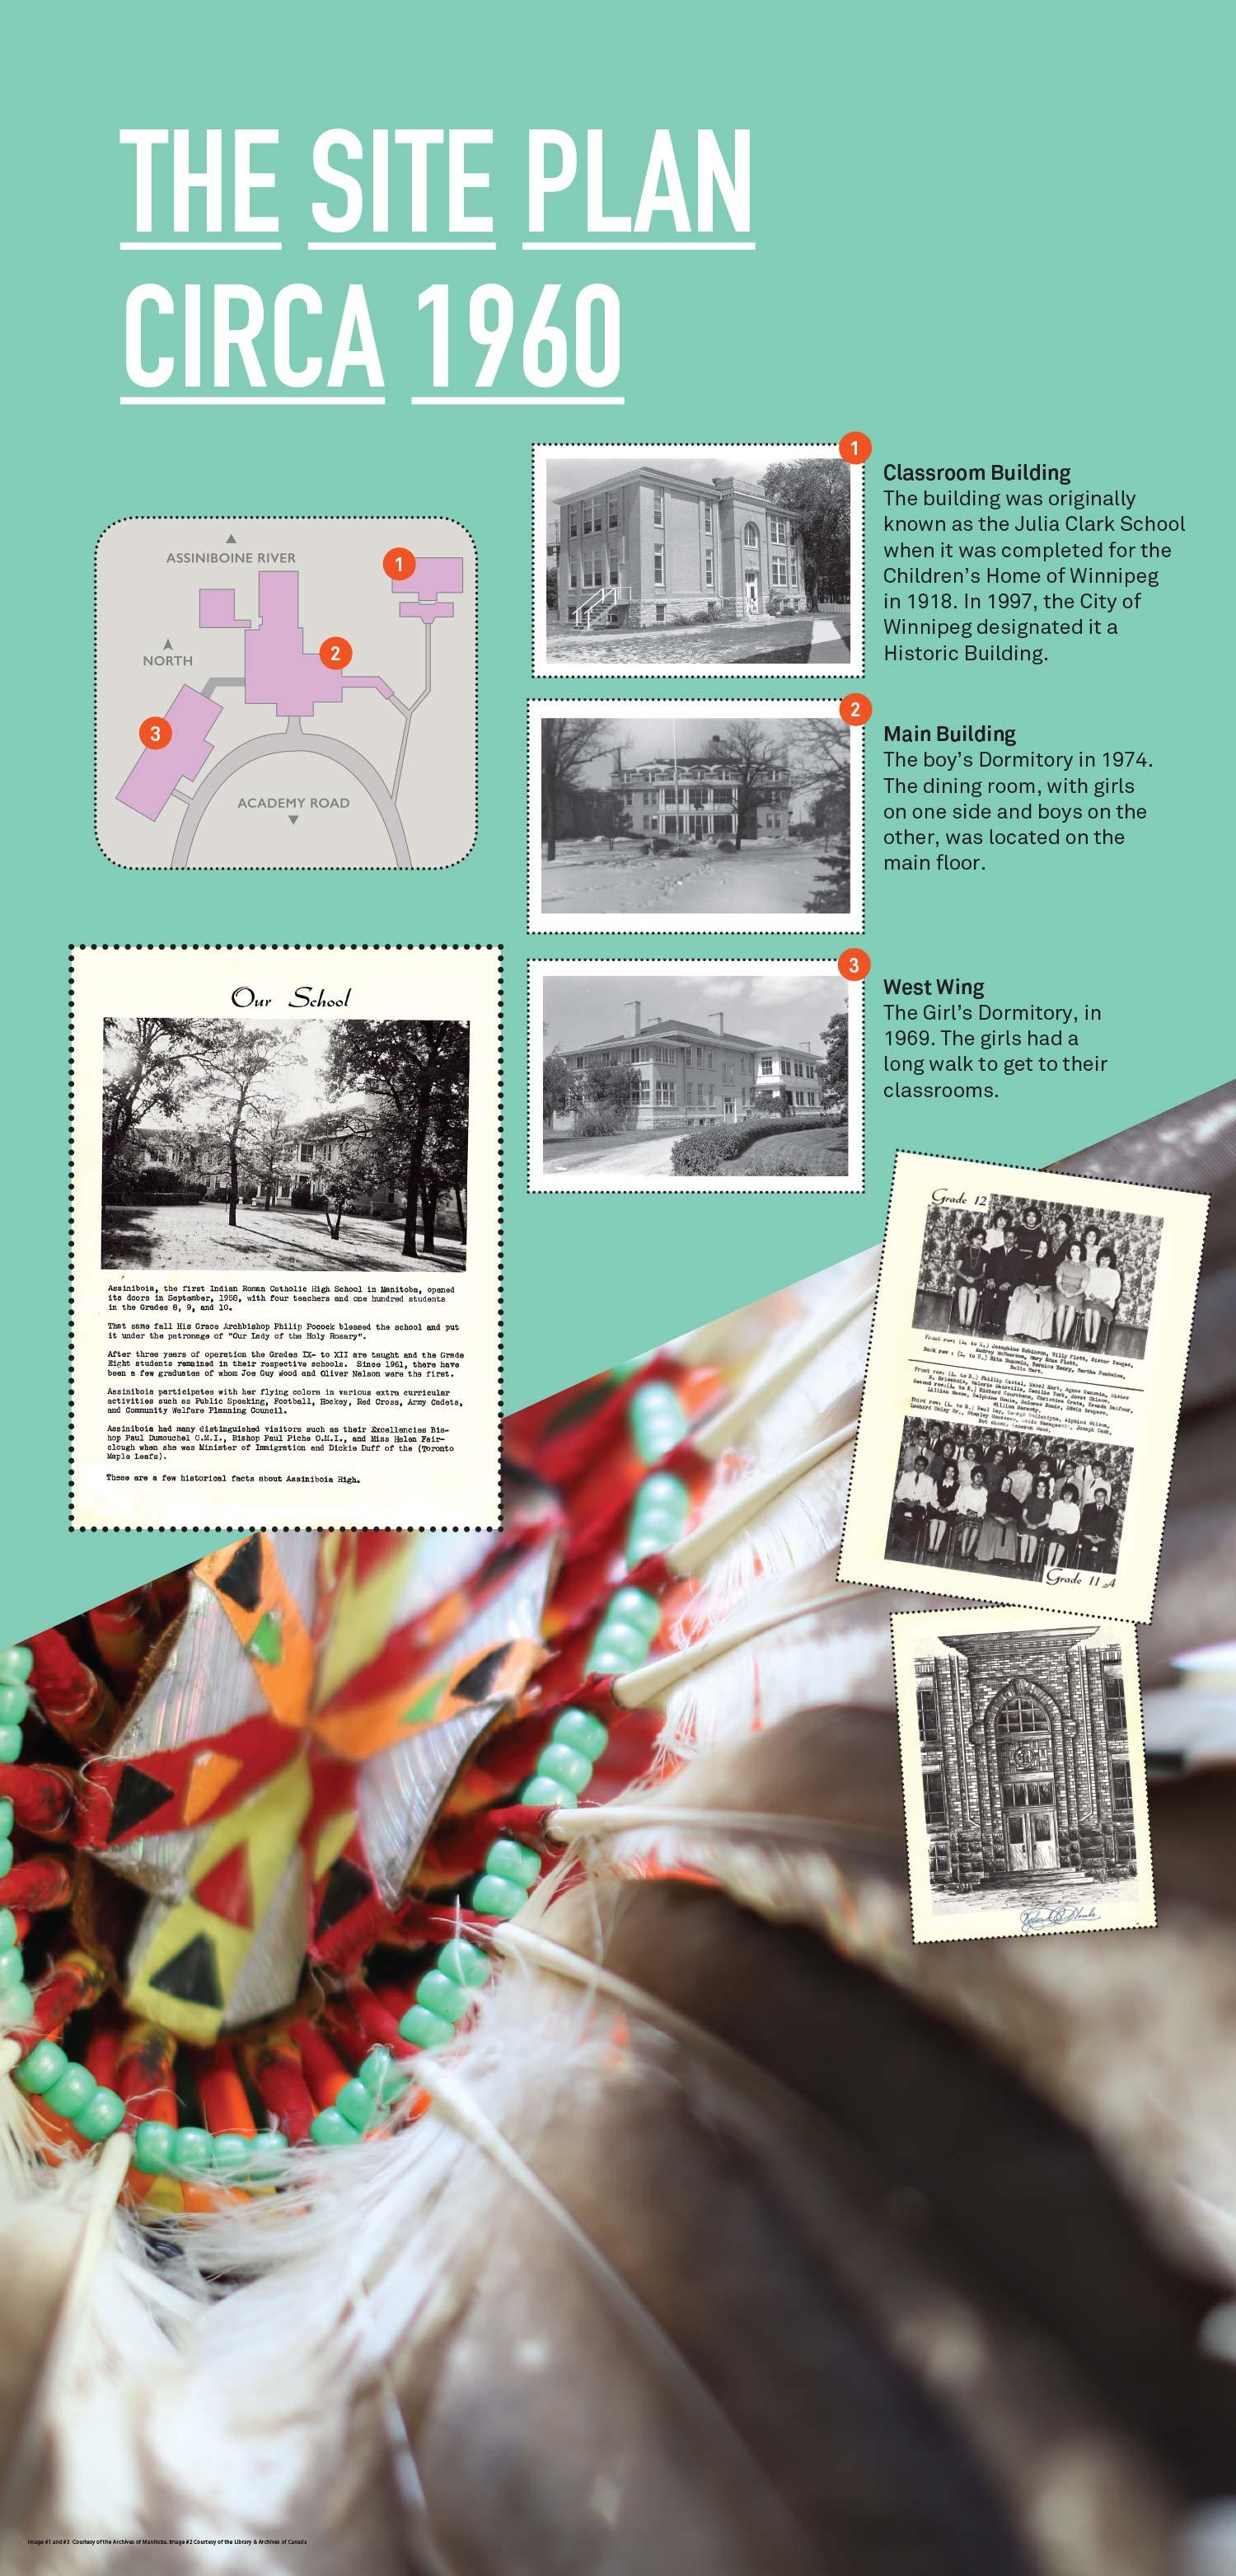 city-winnipeg-residential-school-display-aniko-szabo2.jpg